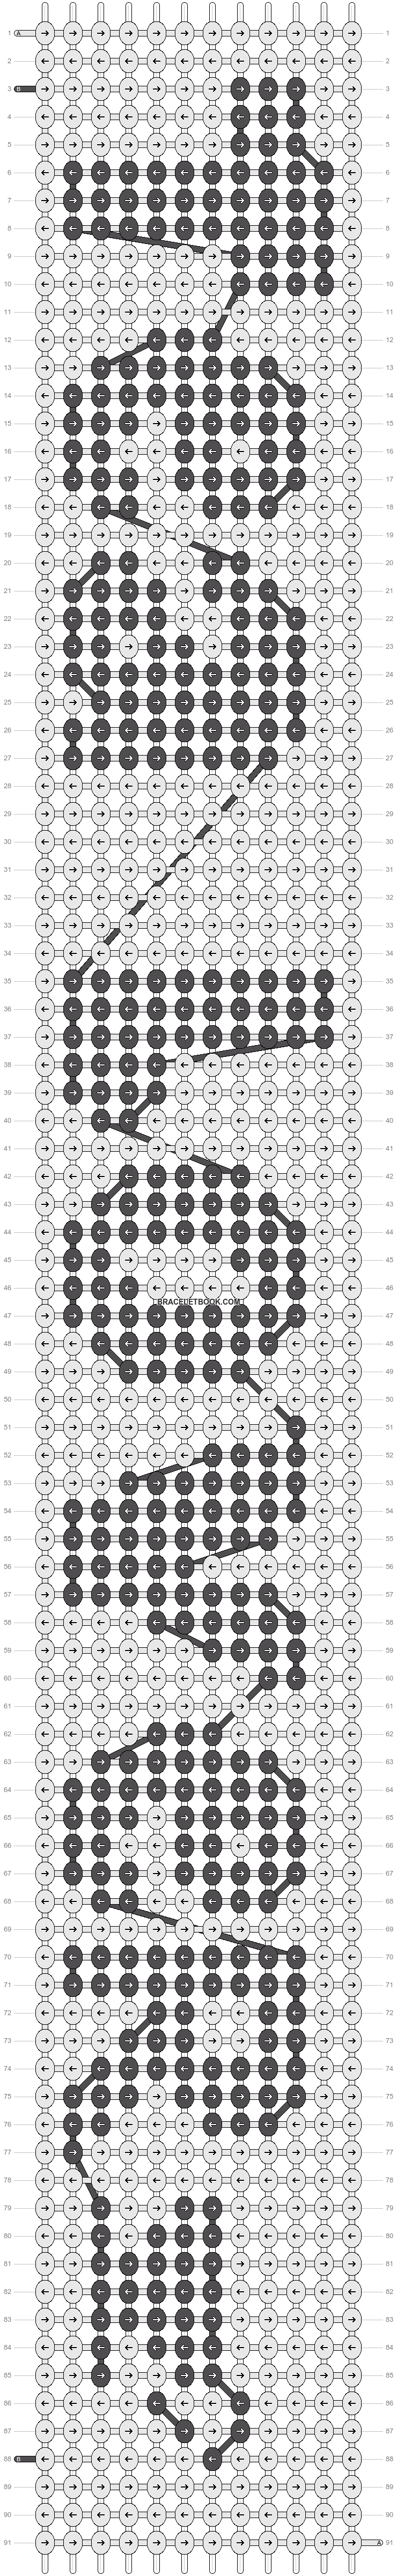 Alpha pattern #11038 pattern